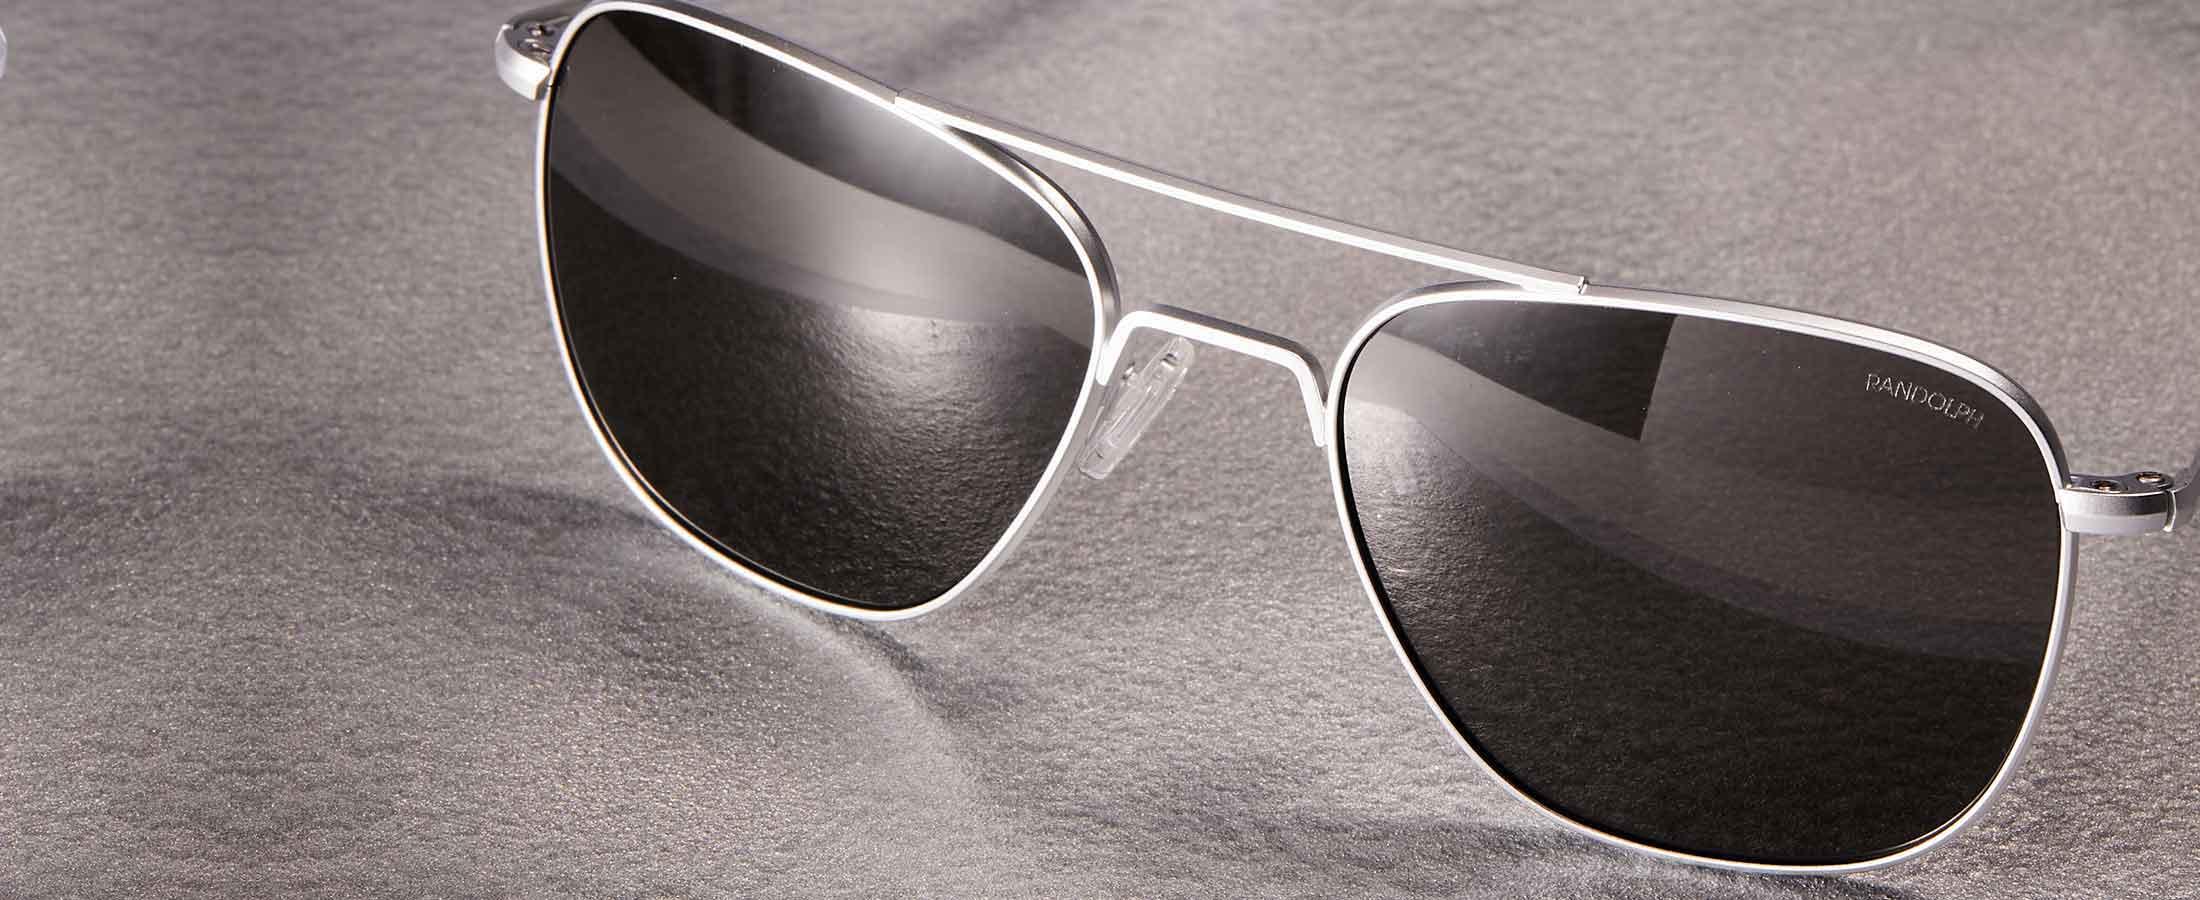 Top Gun 2 Aviator Sunglasses